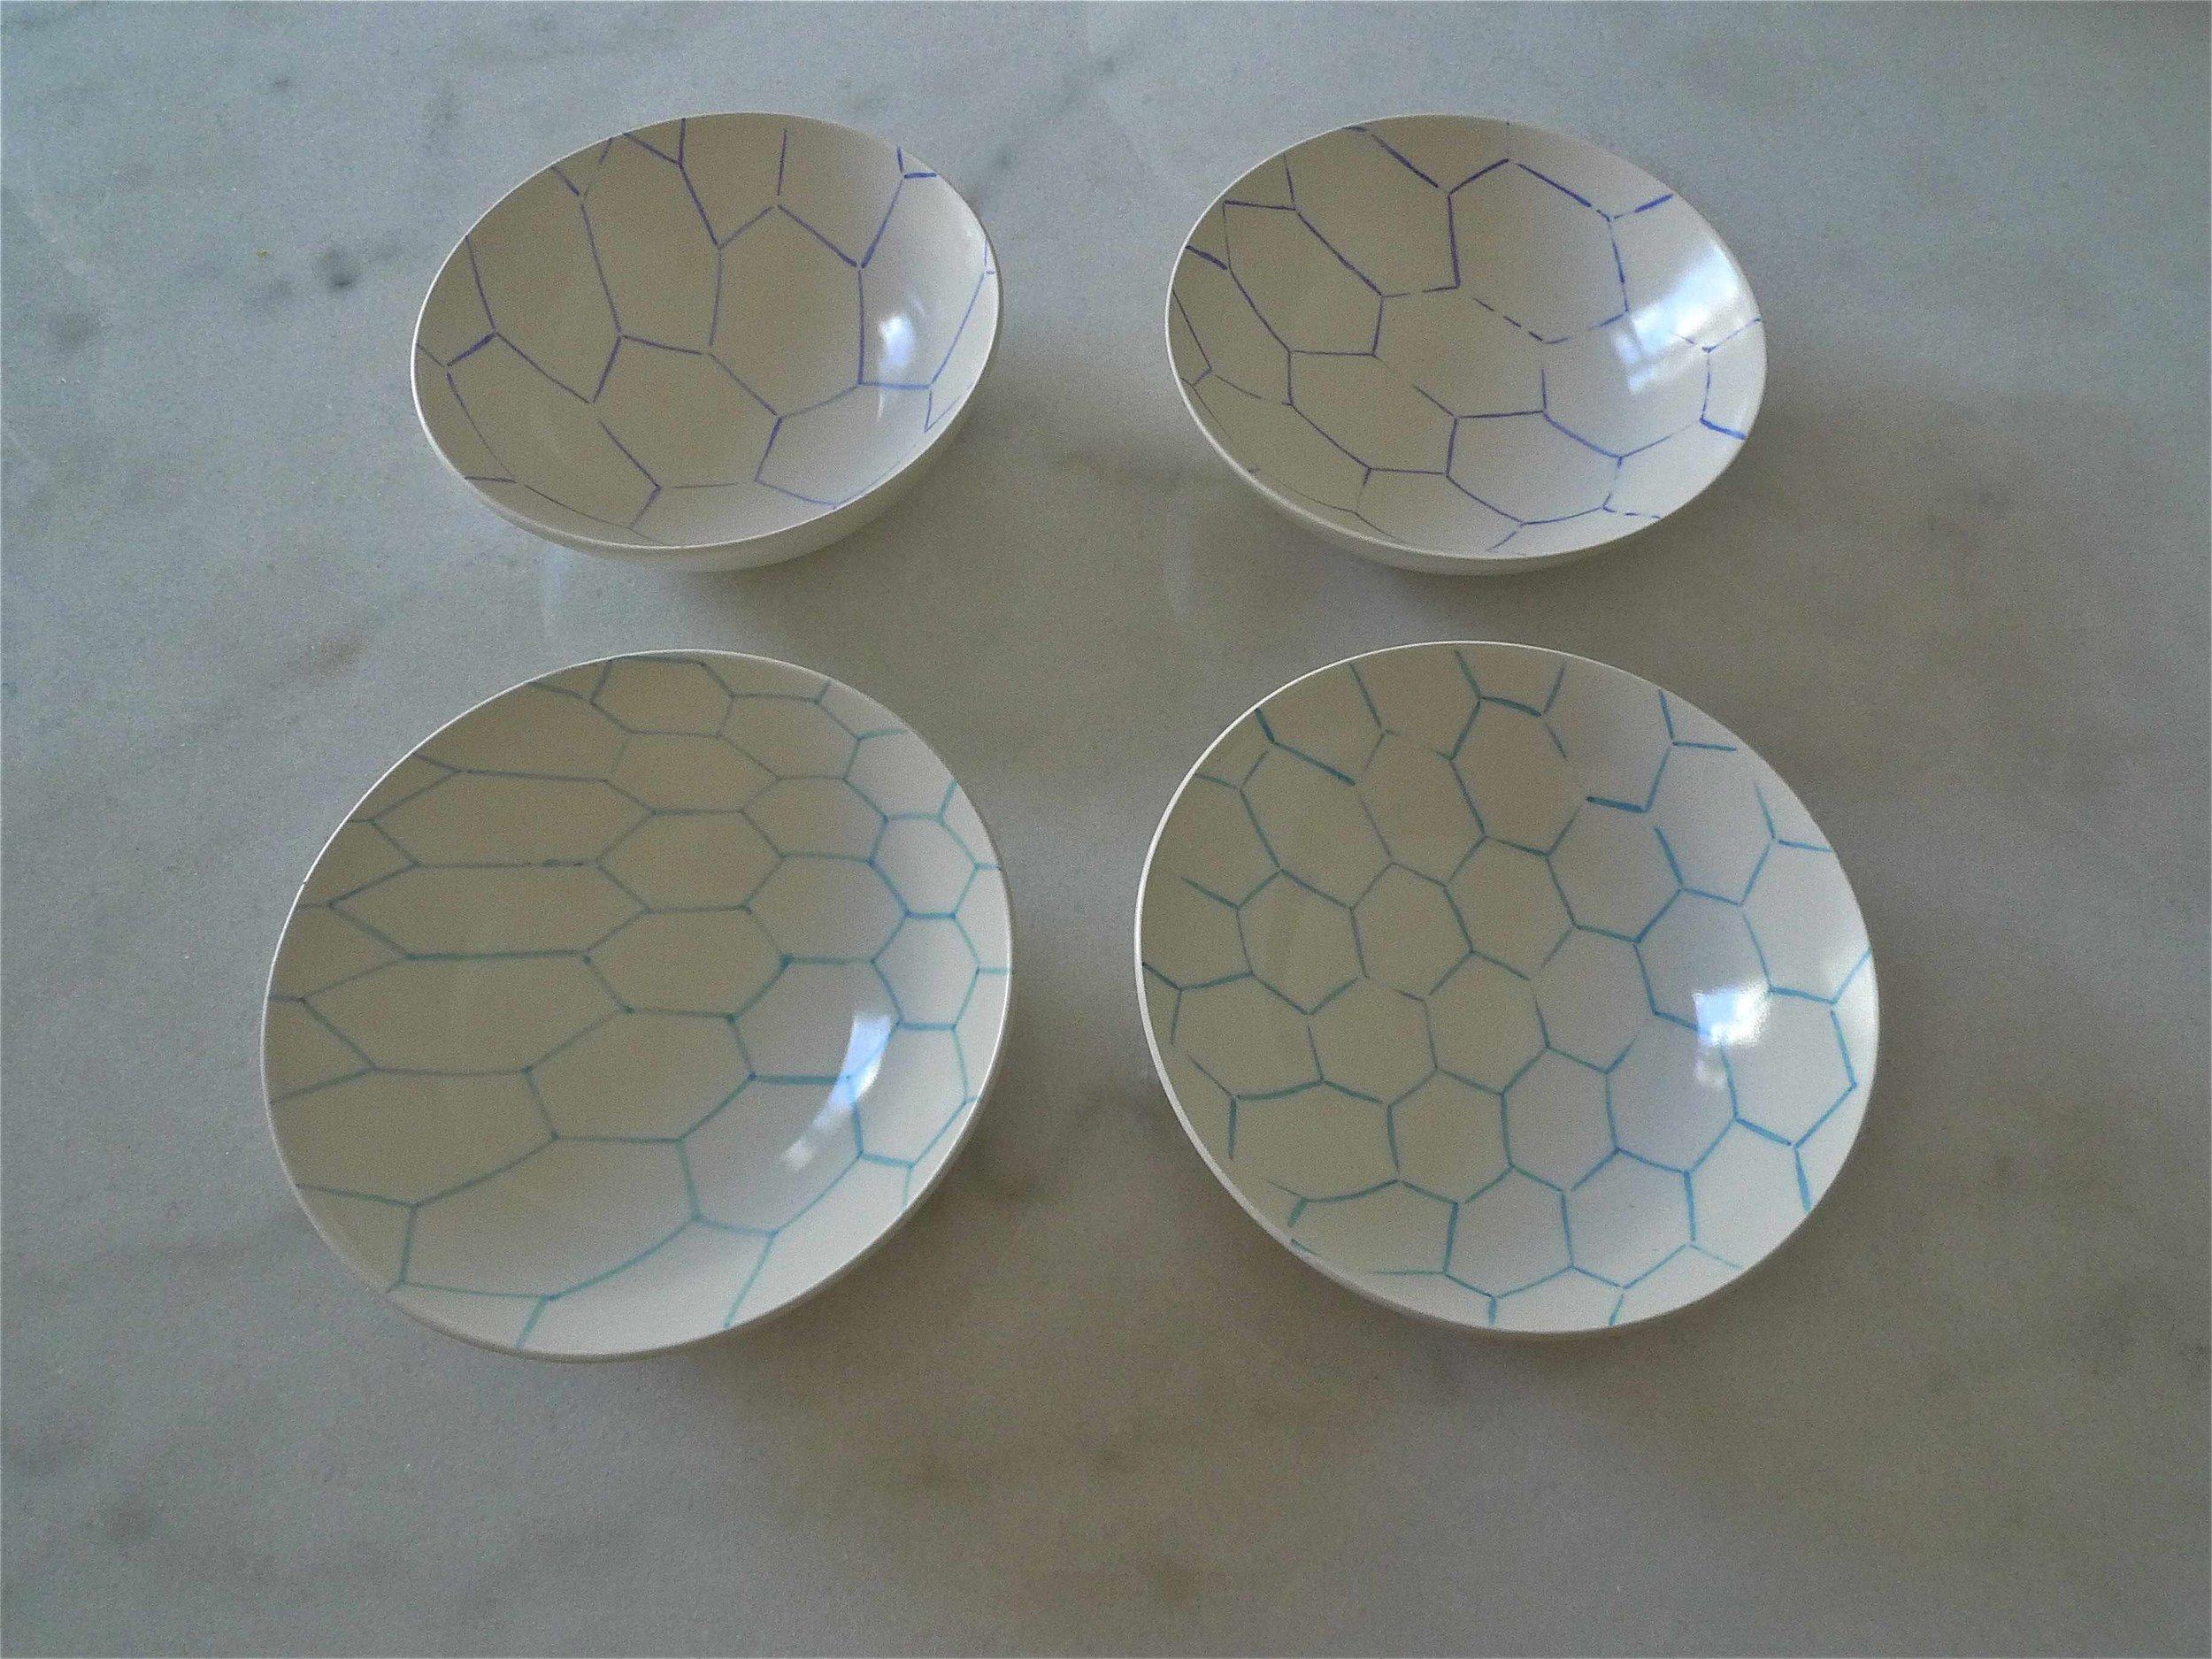 white ceramic body light : hexagon line perspective in black, blue or red) 3x15cm (40 E) 3x12cm (35E)